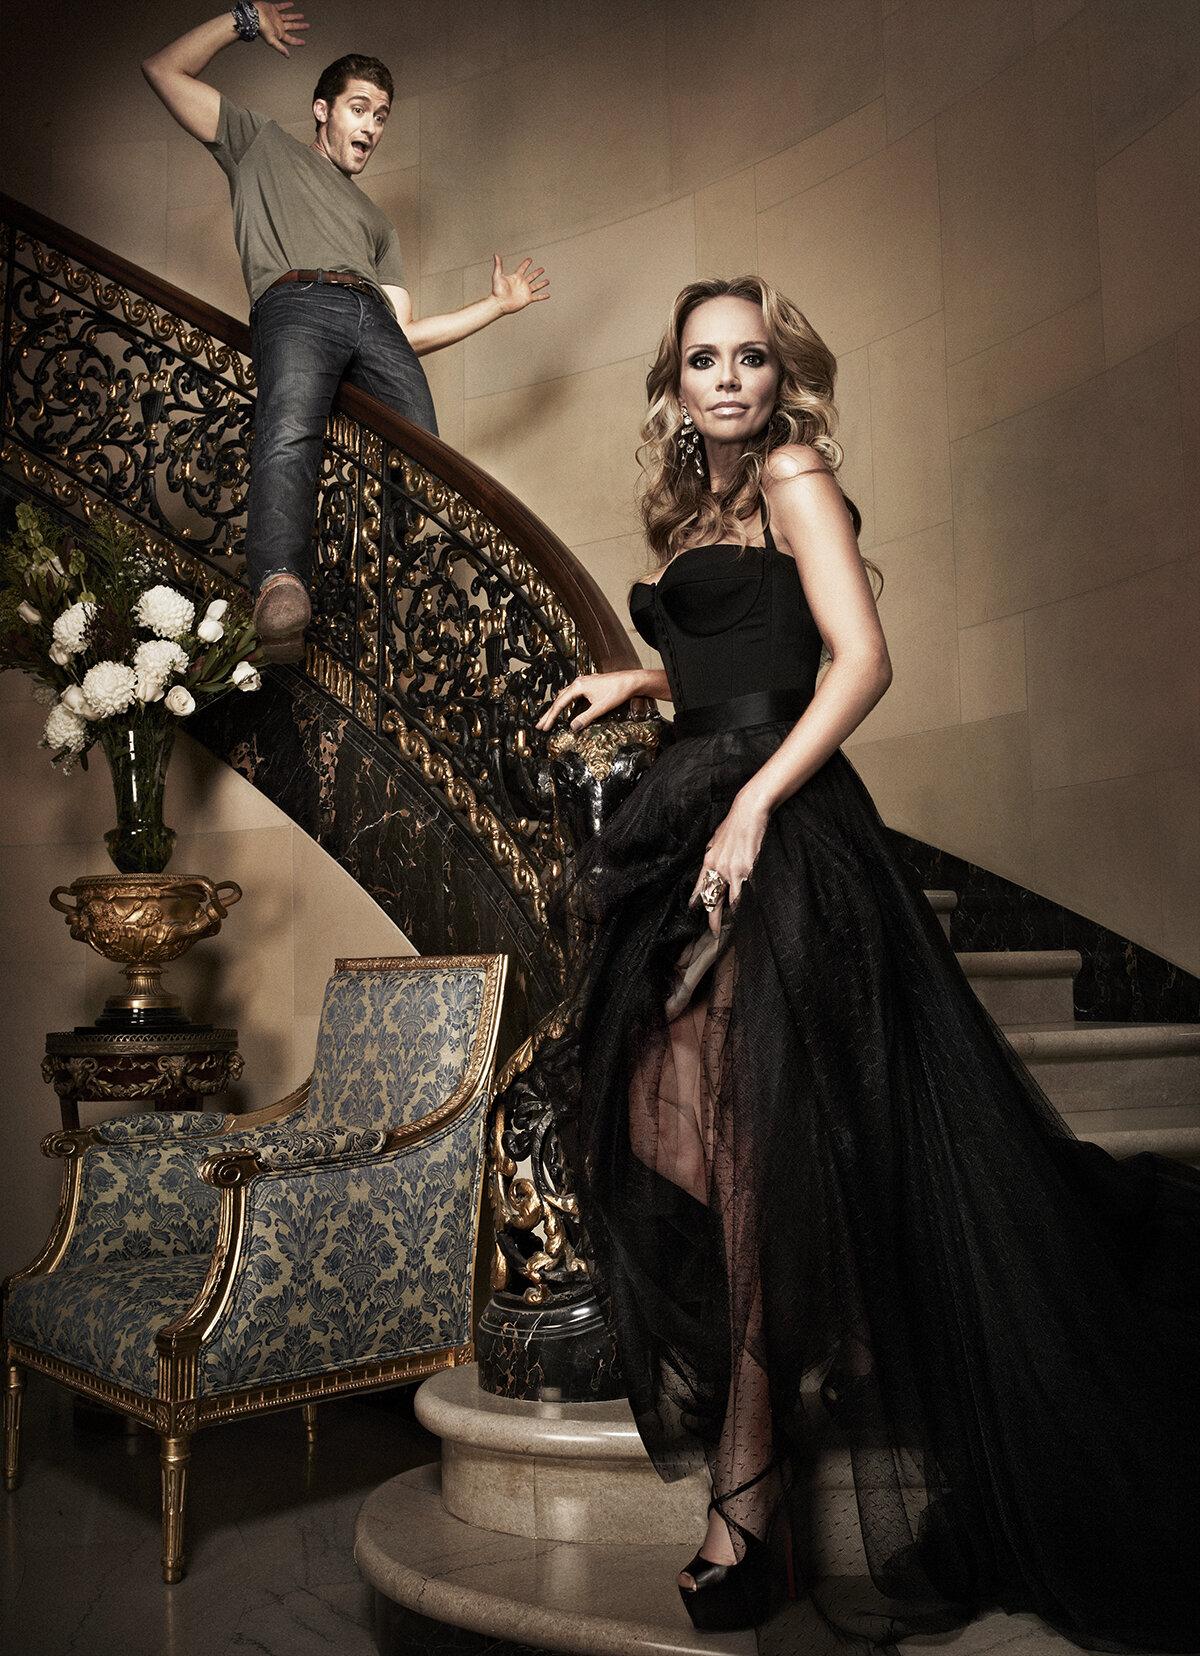 Kristen_Chenoweth_Stairs_further_retouched.jpg